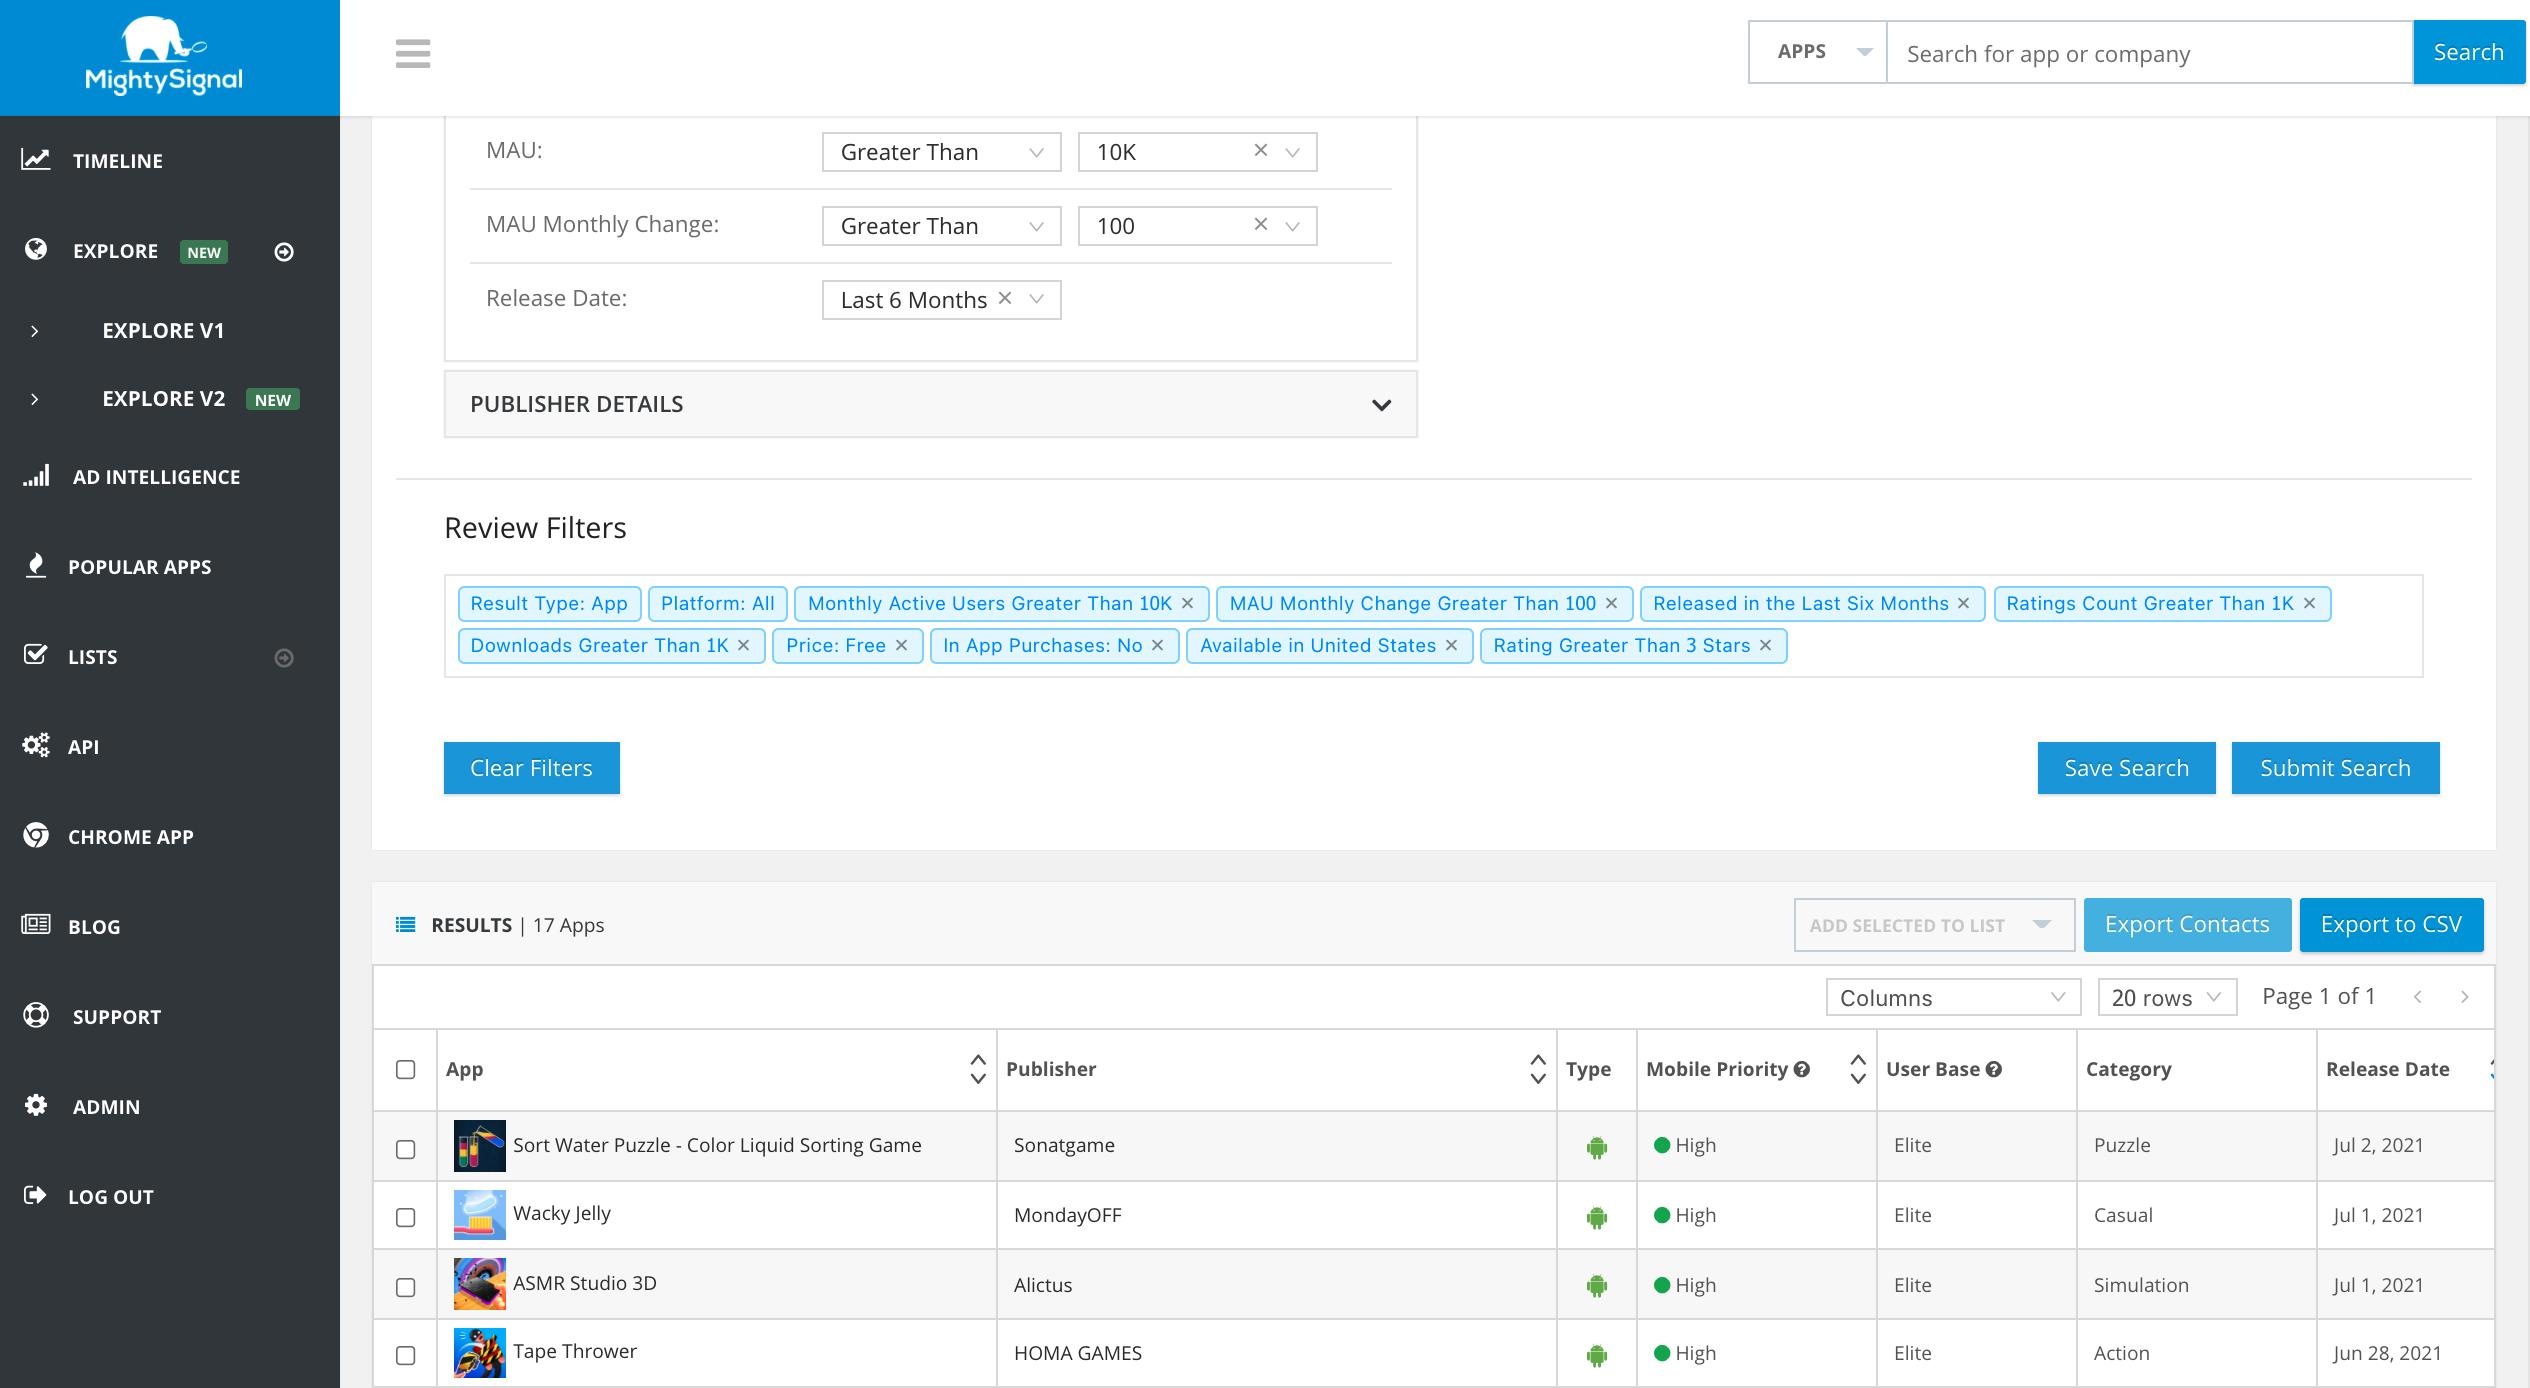 MightySignal Upgrades MAU Data